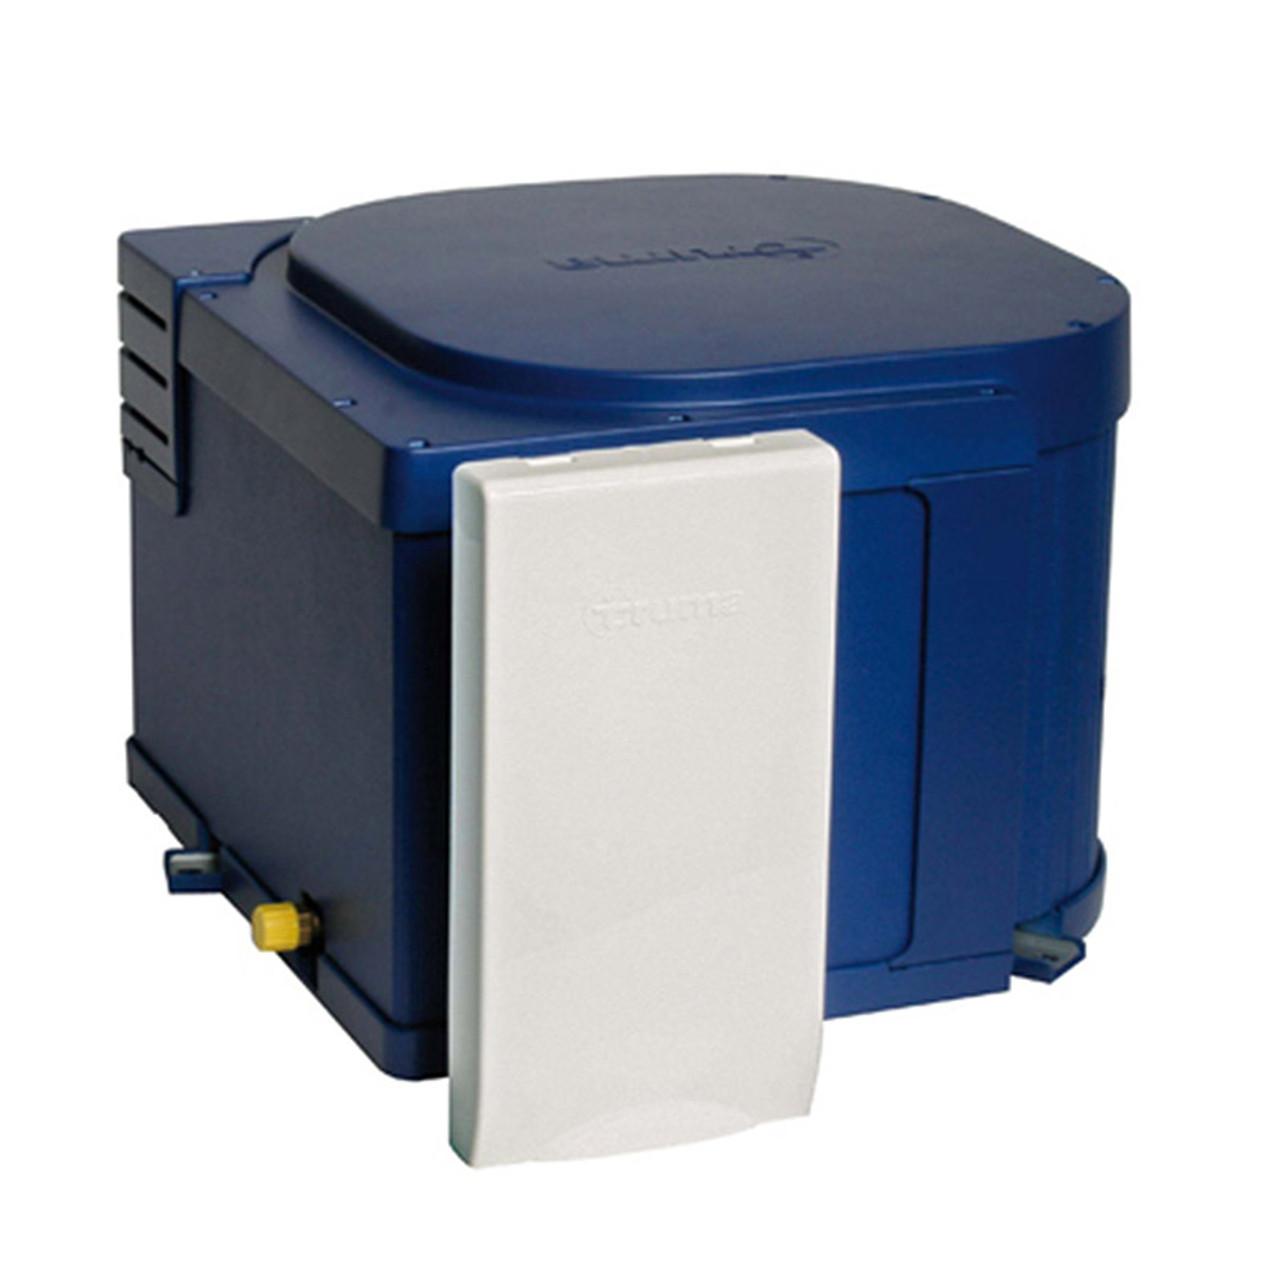 Truma Ultrastore Gas & Electric Caravan 10 Litre Water Heater